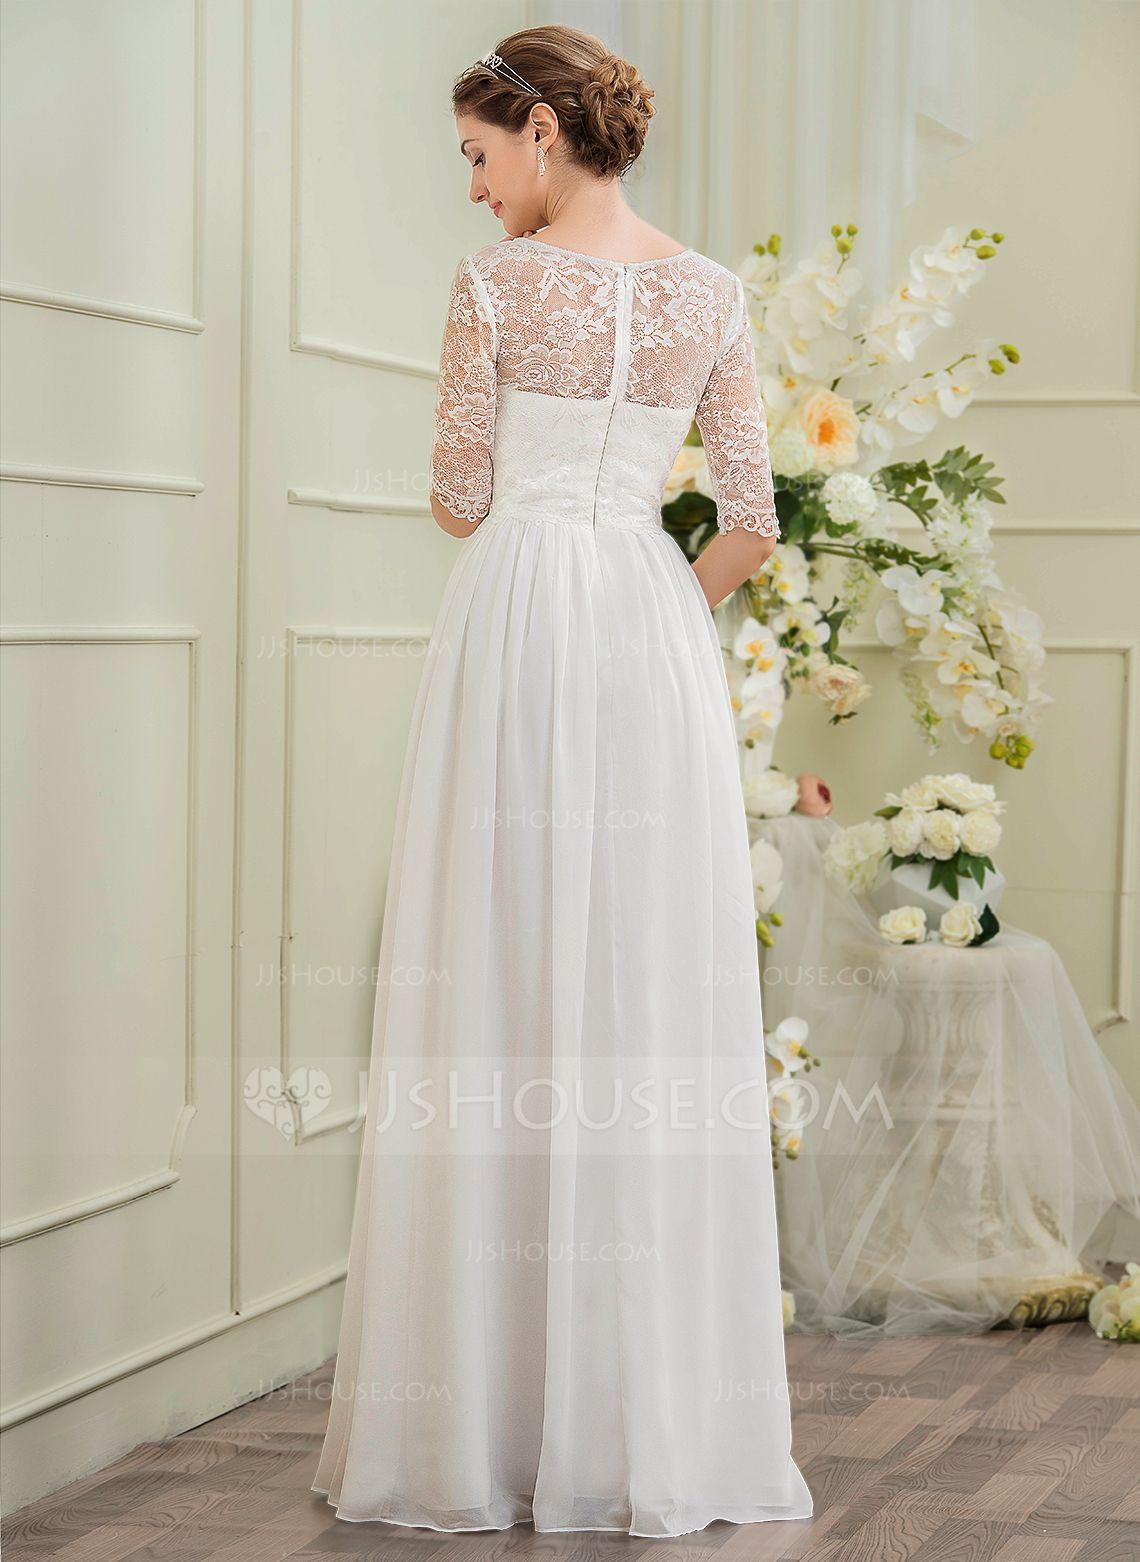 169 00 A Linjainen Prinsessa V Kaula Aukko Hovilaahus Sifonki Morsiuspuku Jossa Helmikoristelu Jj S House Stylish Wedding Dresses Chiffon Wedding Dress Wedding Dresses [ 1562 x 1140 Pixel ]